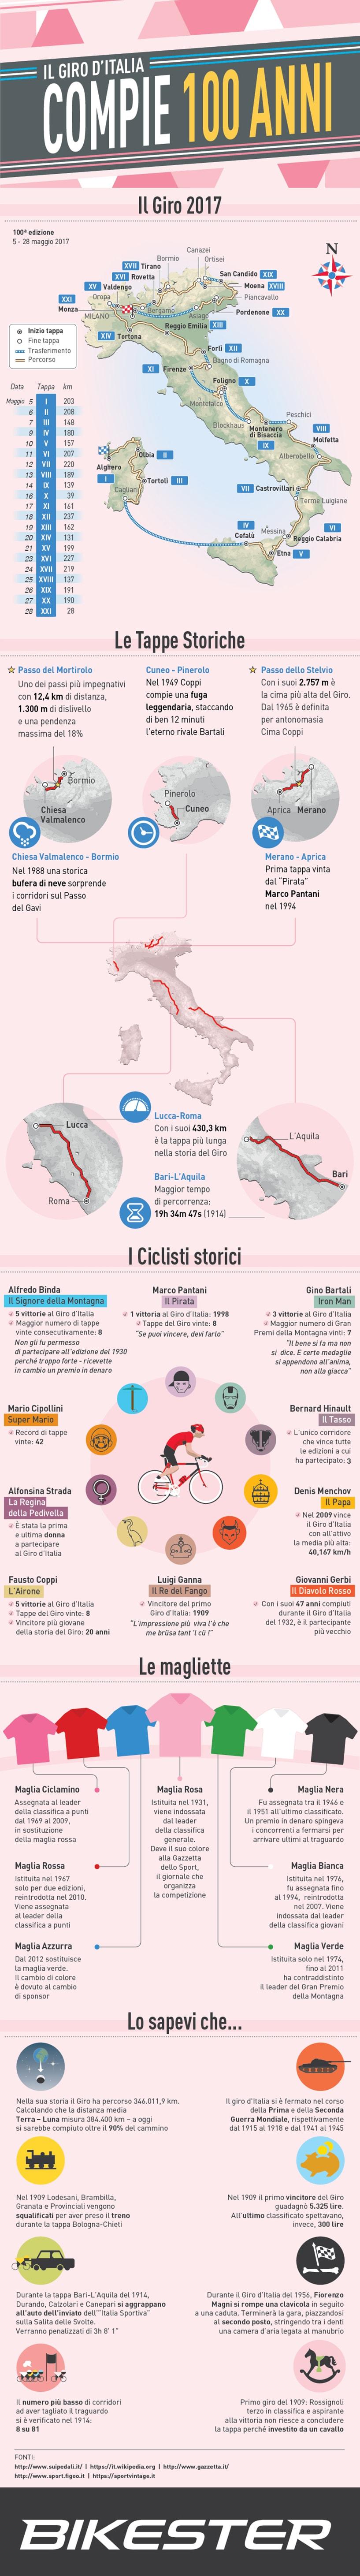 infografica giro d'italia 2017